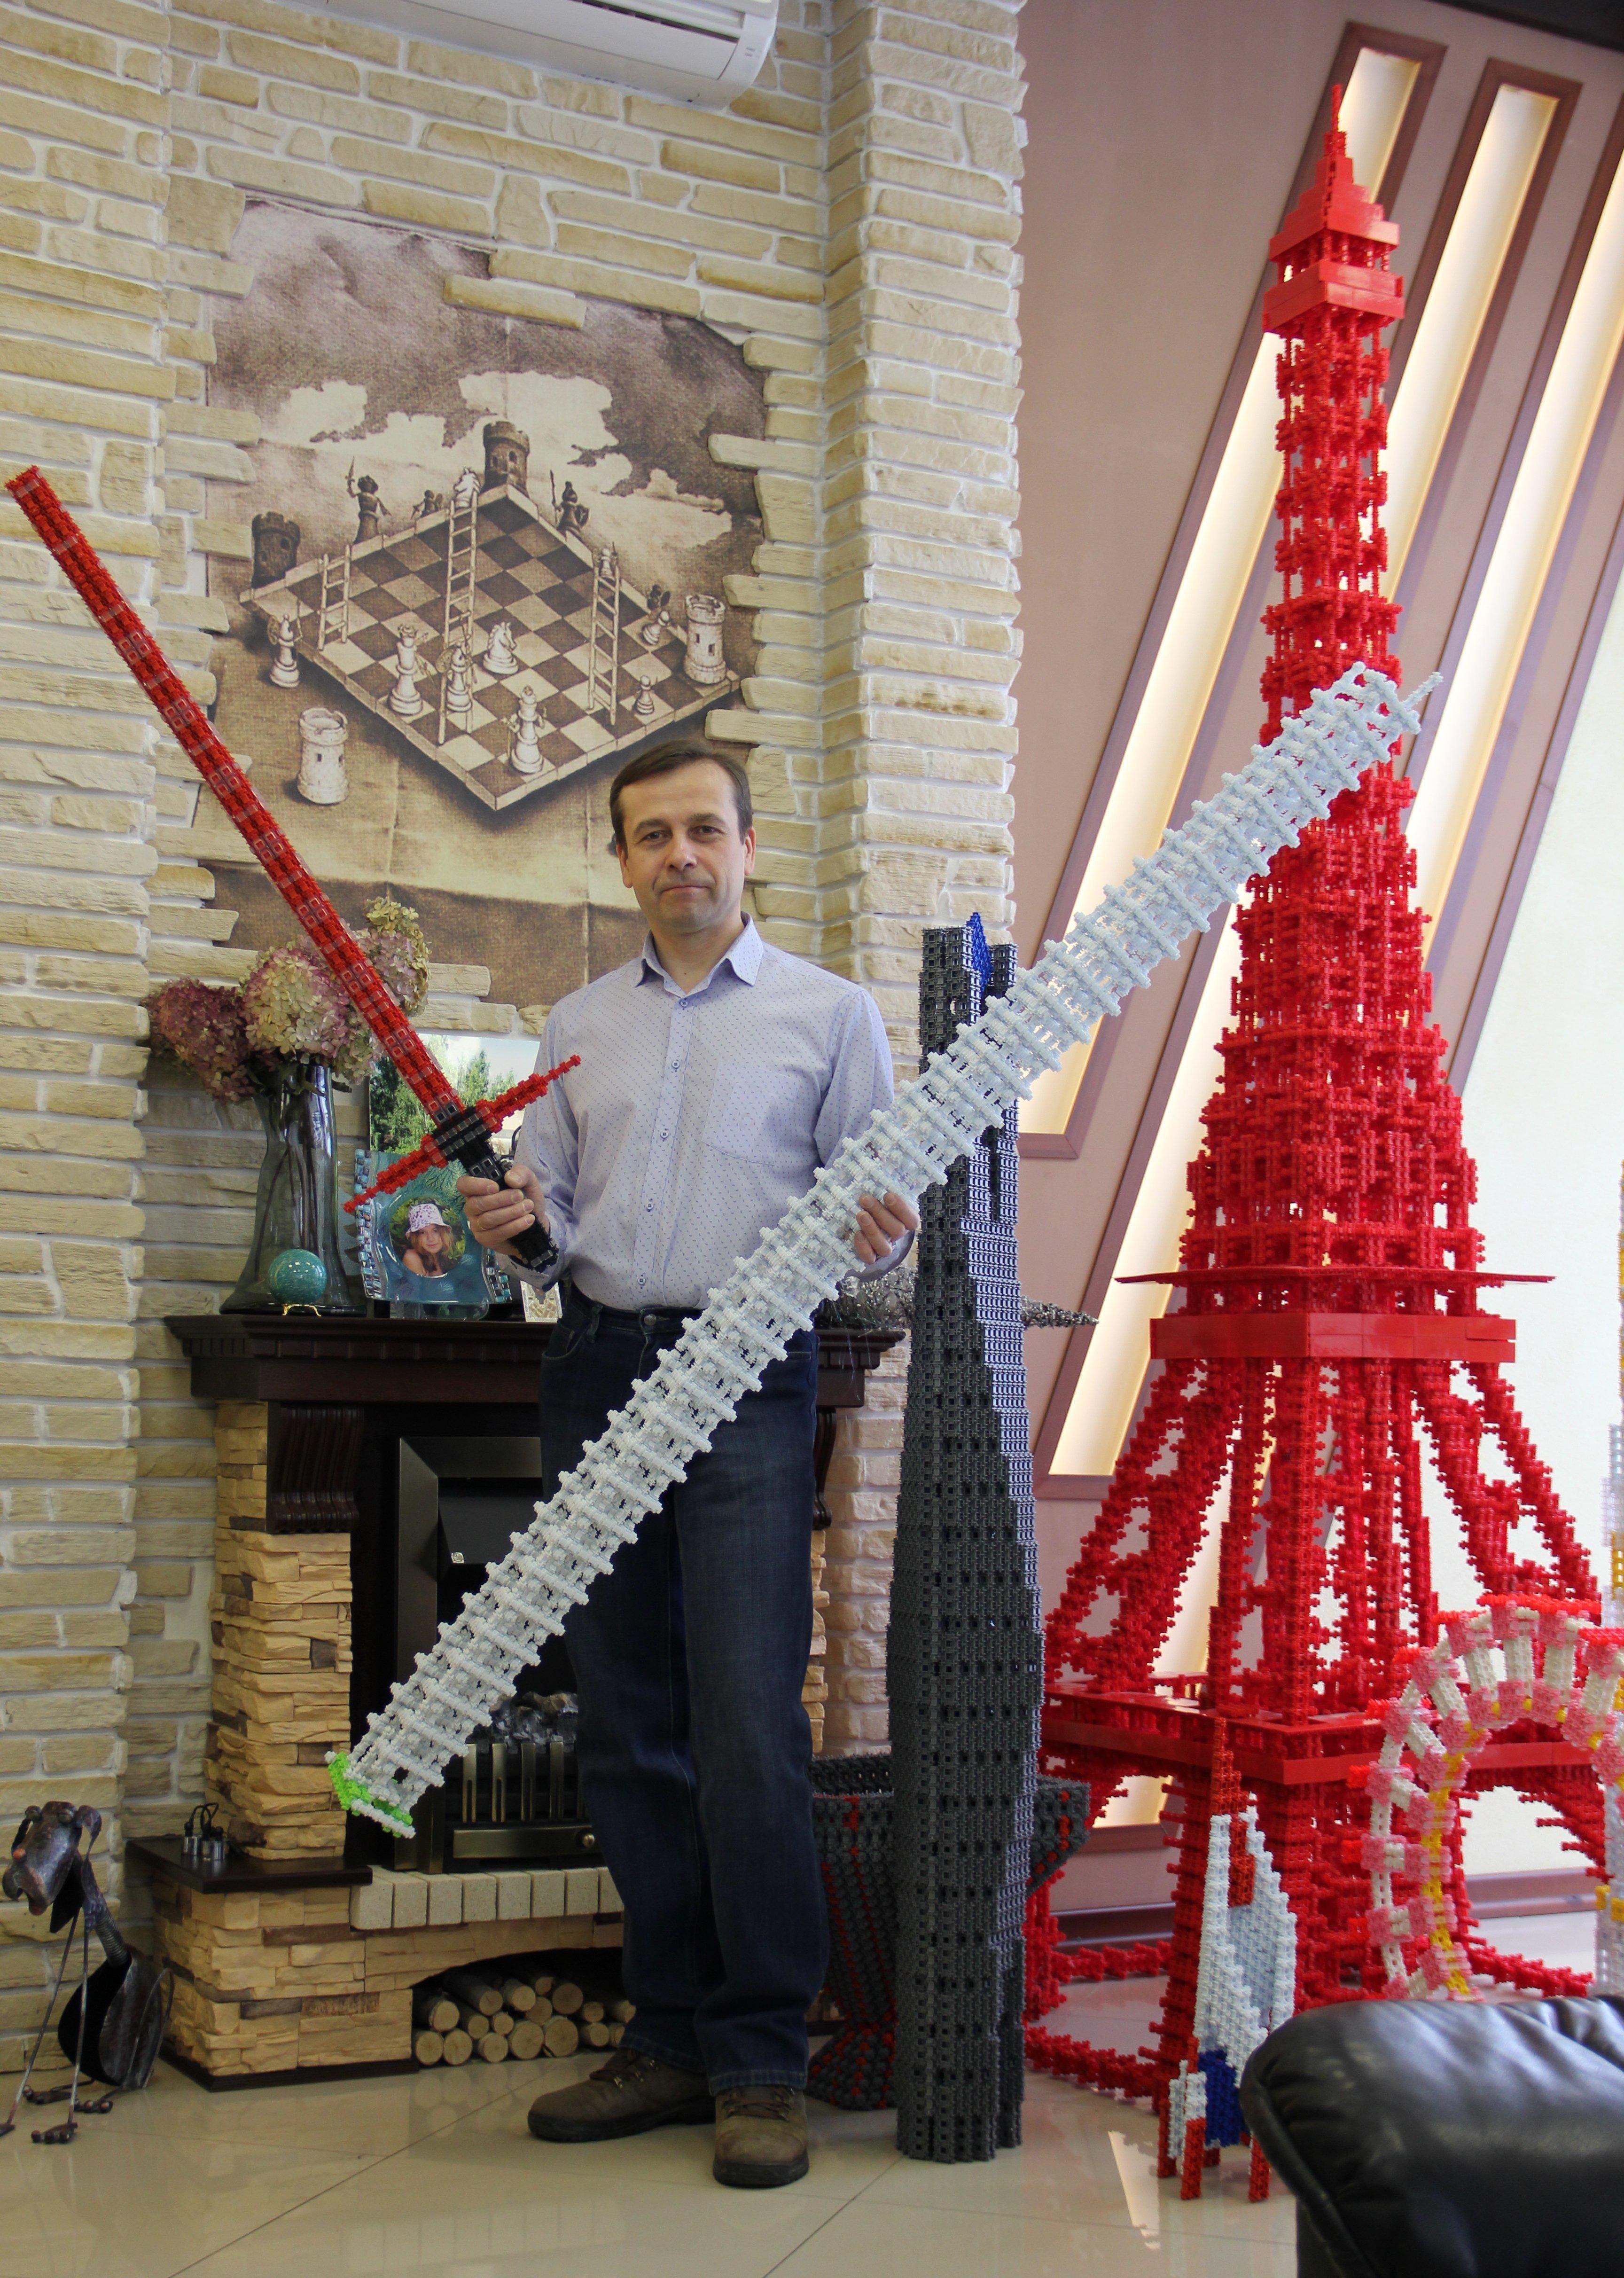 Fanclastic-inventor Dmitry Sokolov